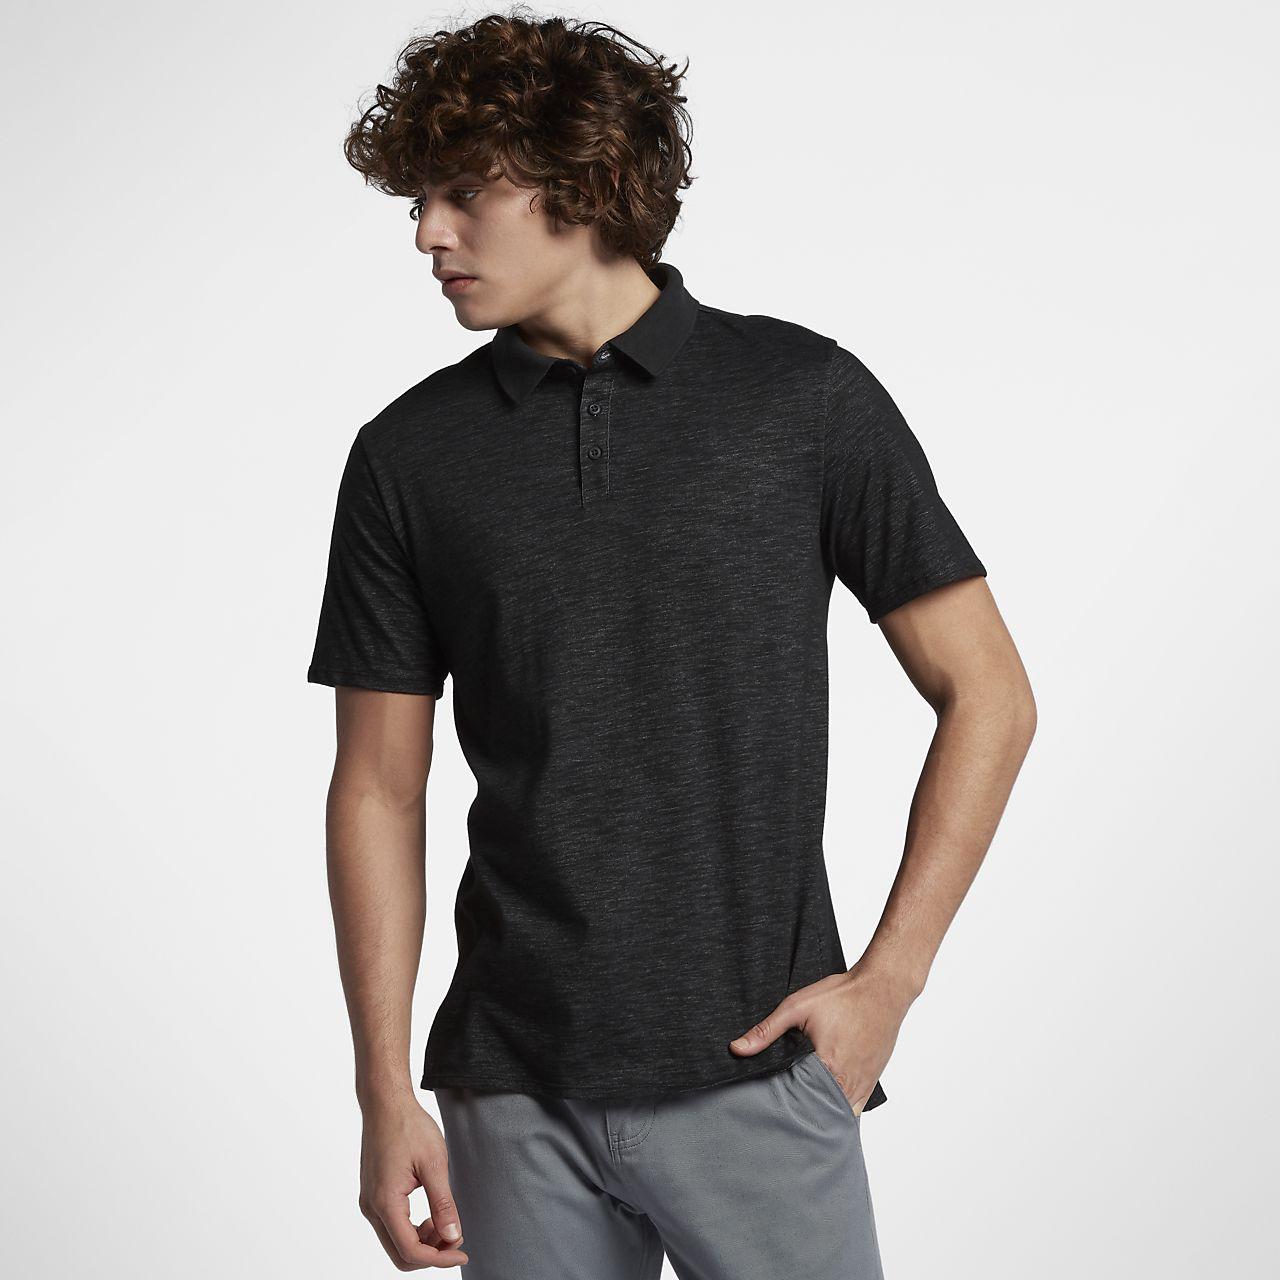 a85c4748 Hurley Dri-FIT Lagos Men's Polo. Nike.com SA